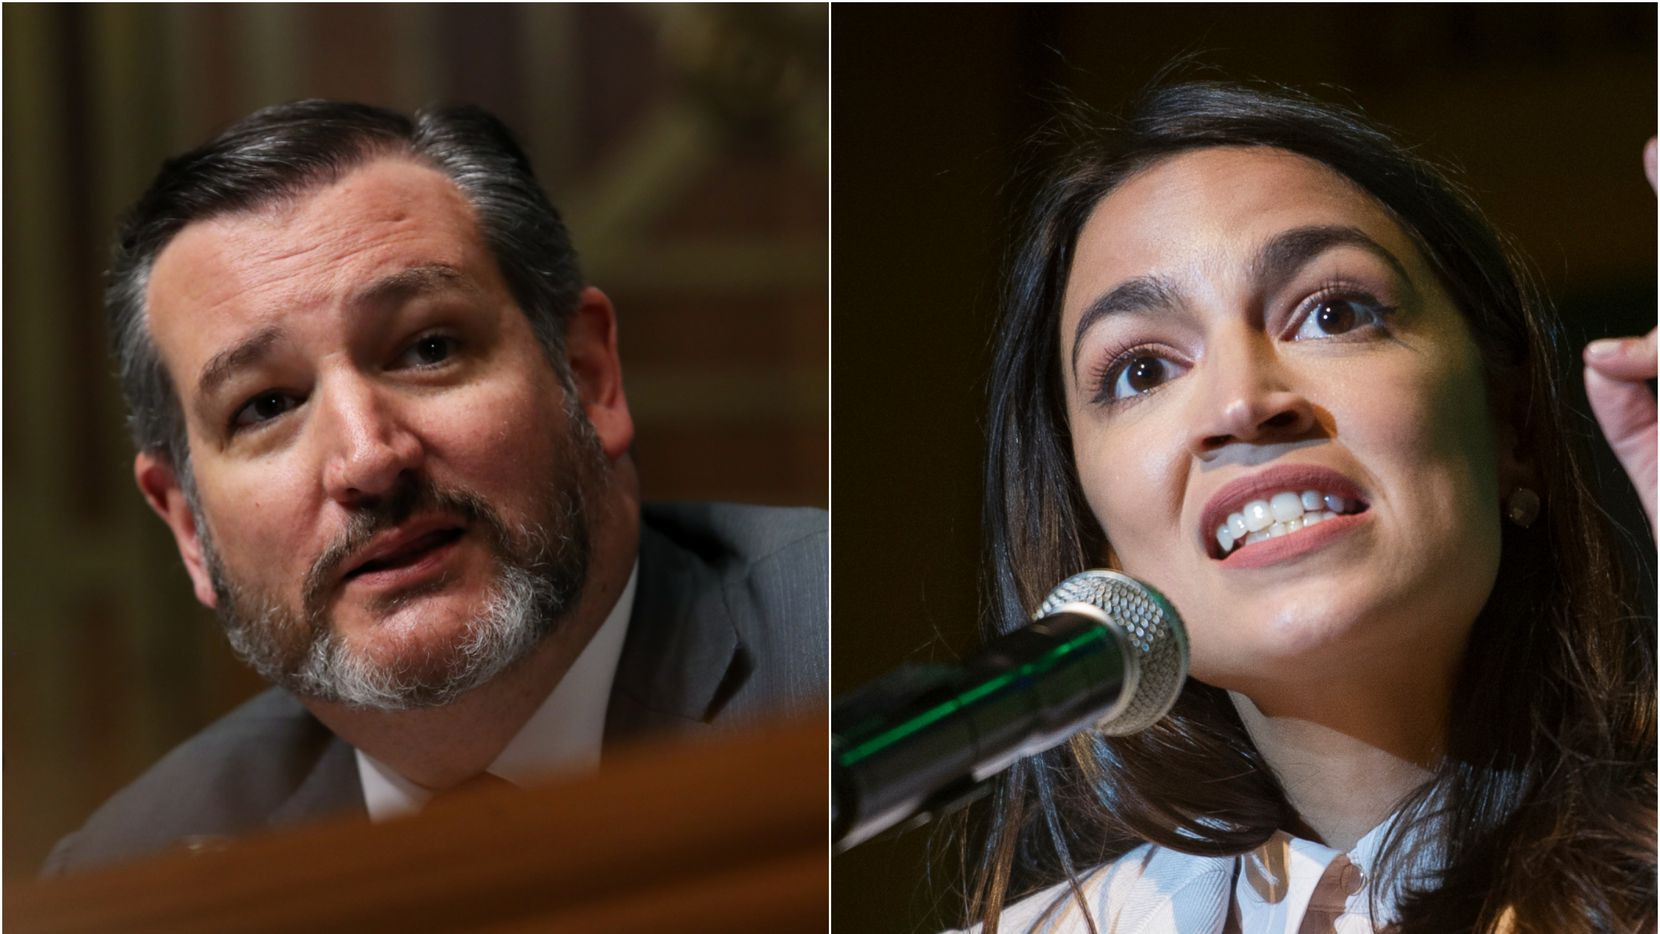 Sen. Ted Cruz and Rep. Alexandria Ocasio-Cortez